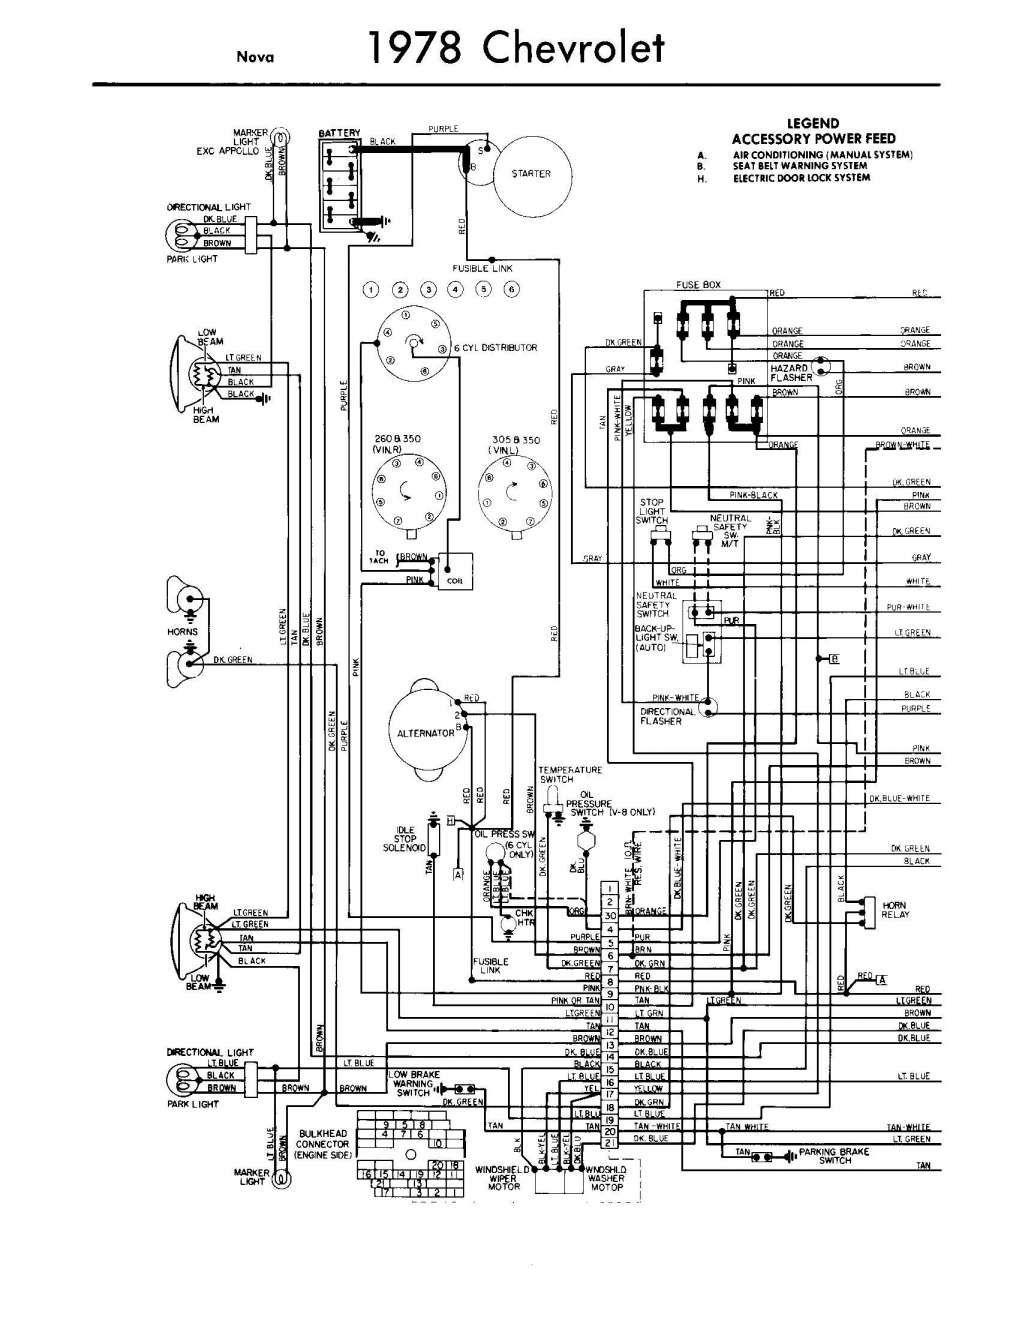 15+ 1988 Chevy Truck 305 Fuse Panel Diagram,Truck Diagram